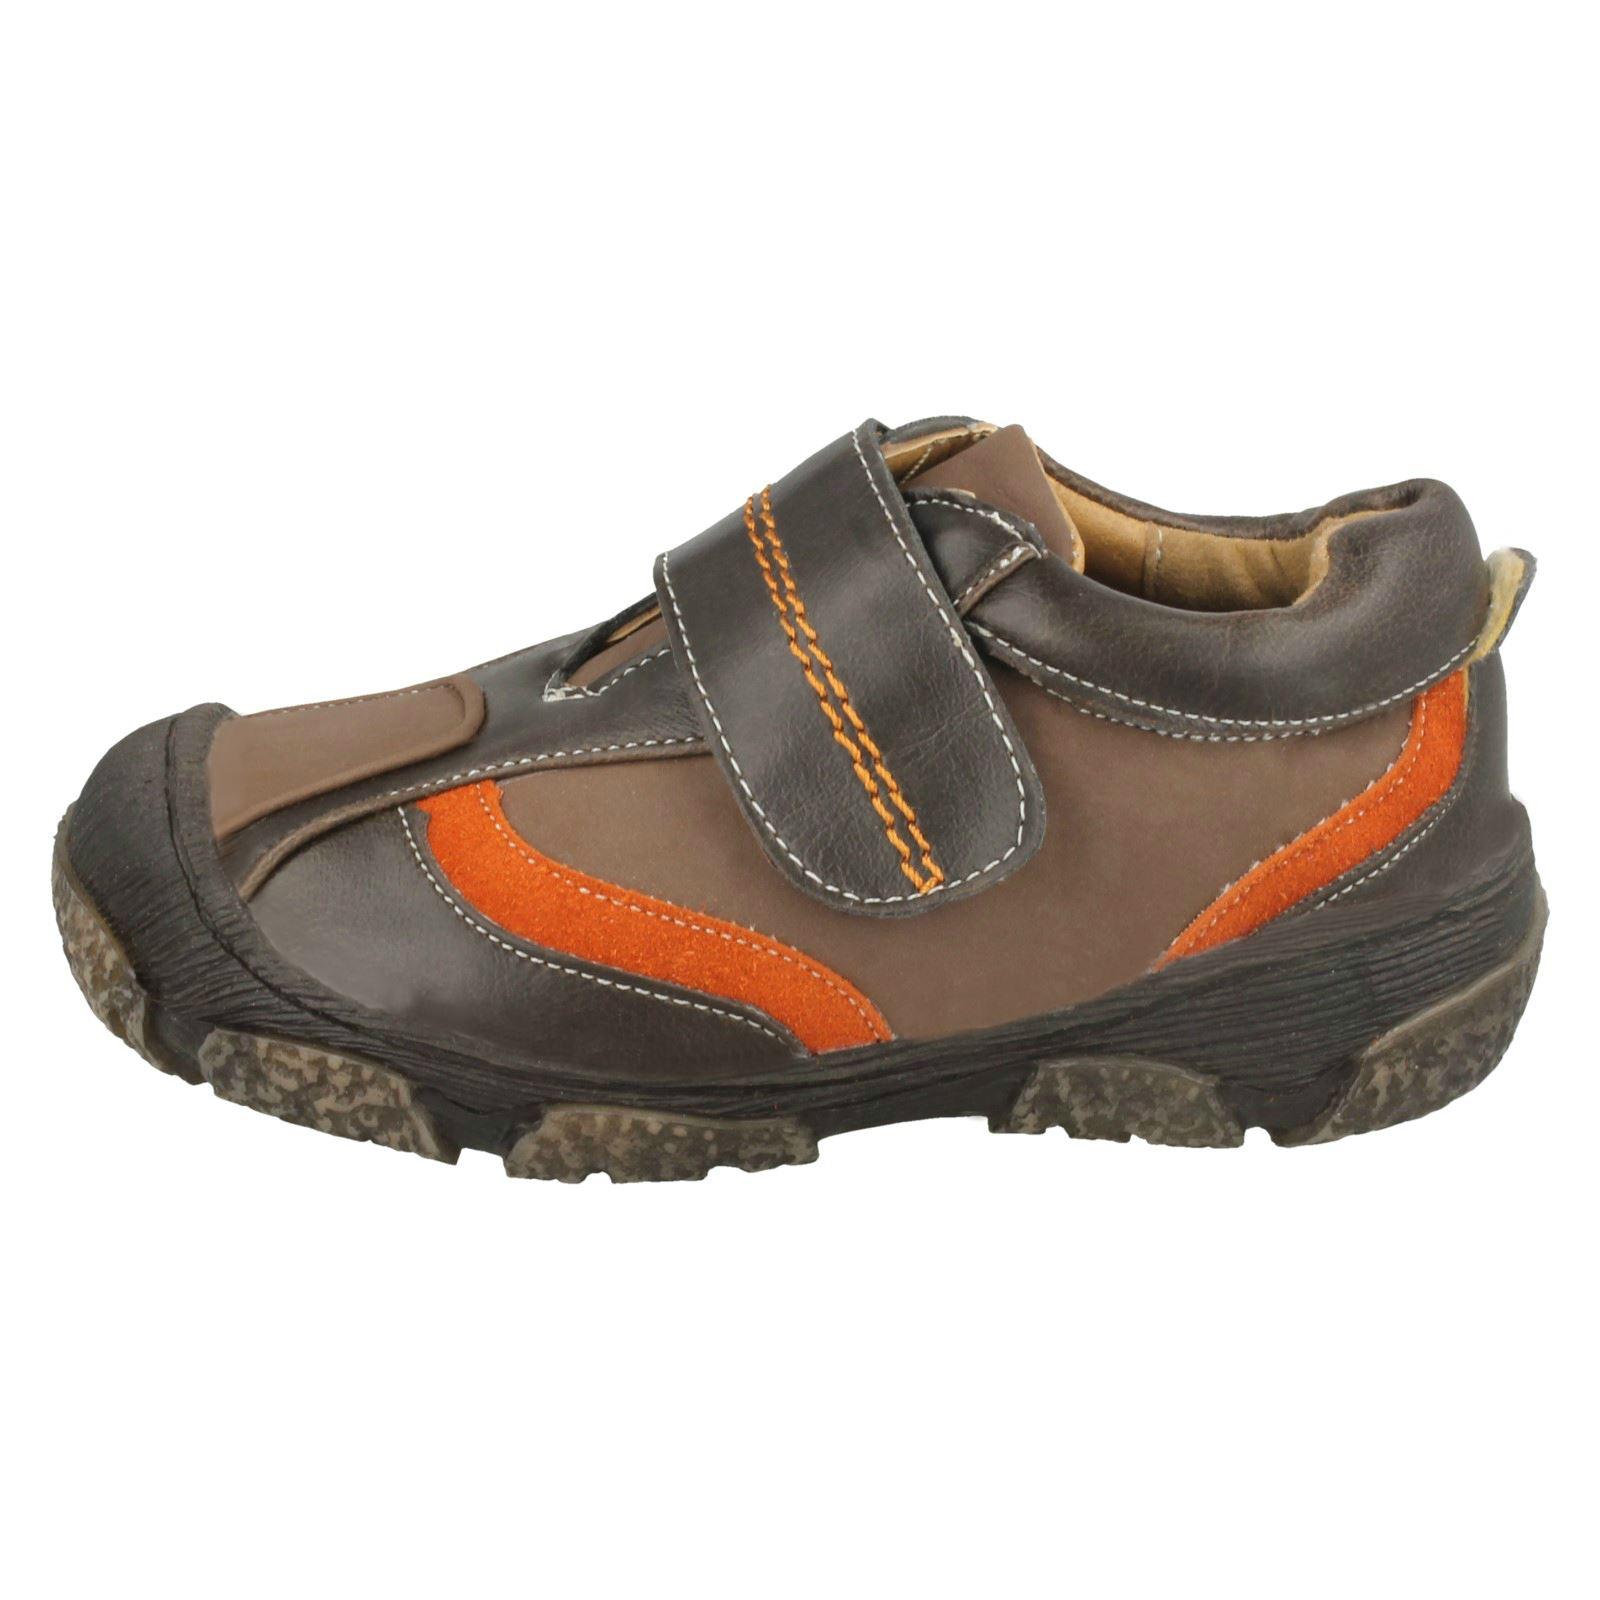 Spot on chicos Plana Informal Zapatos